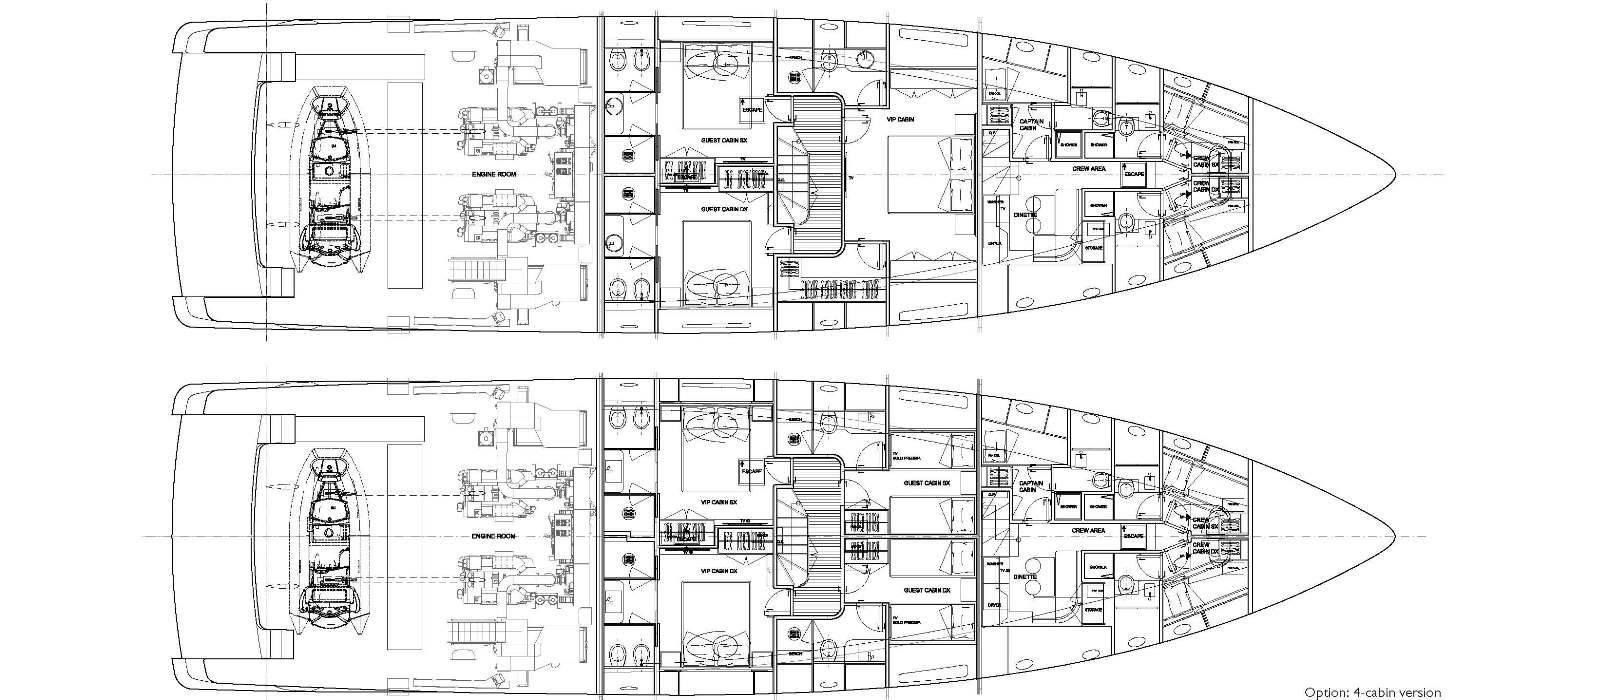 Sanlorenzo Yachts SD96 Lower deck